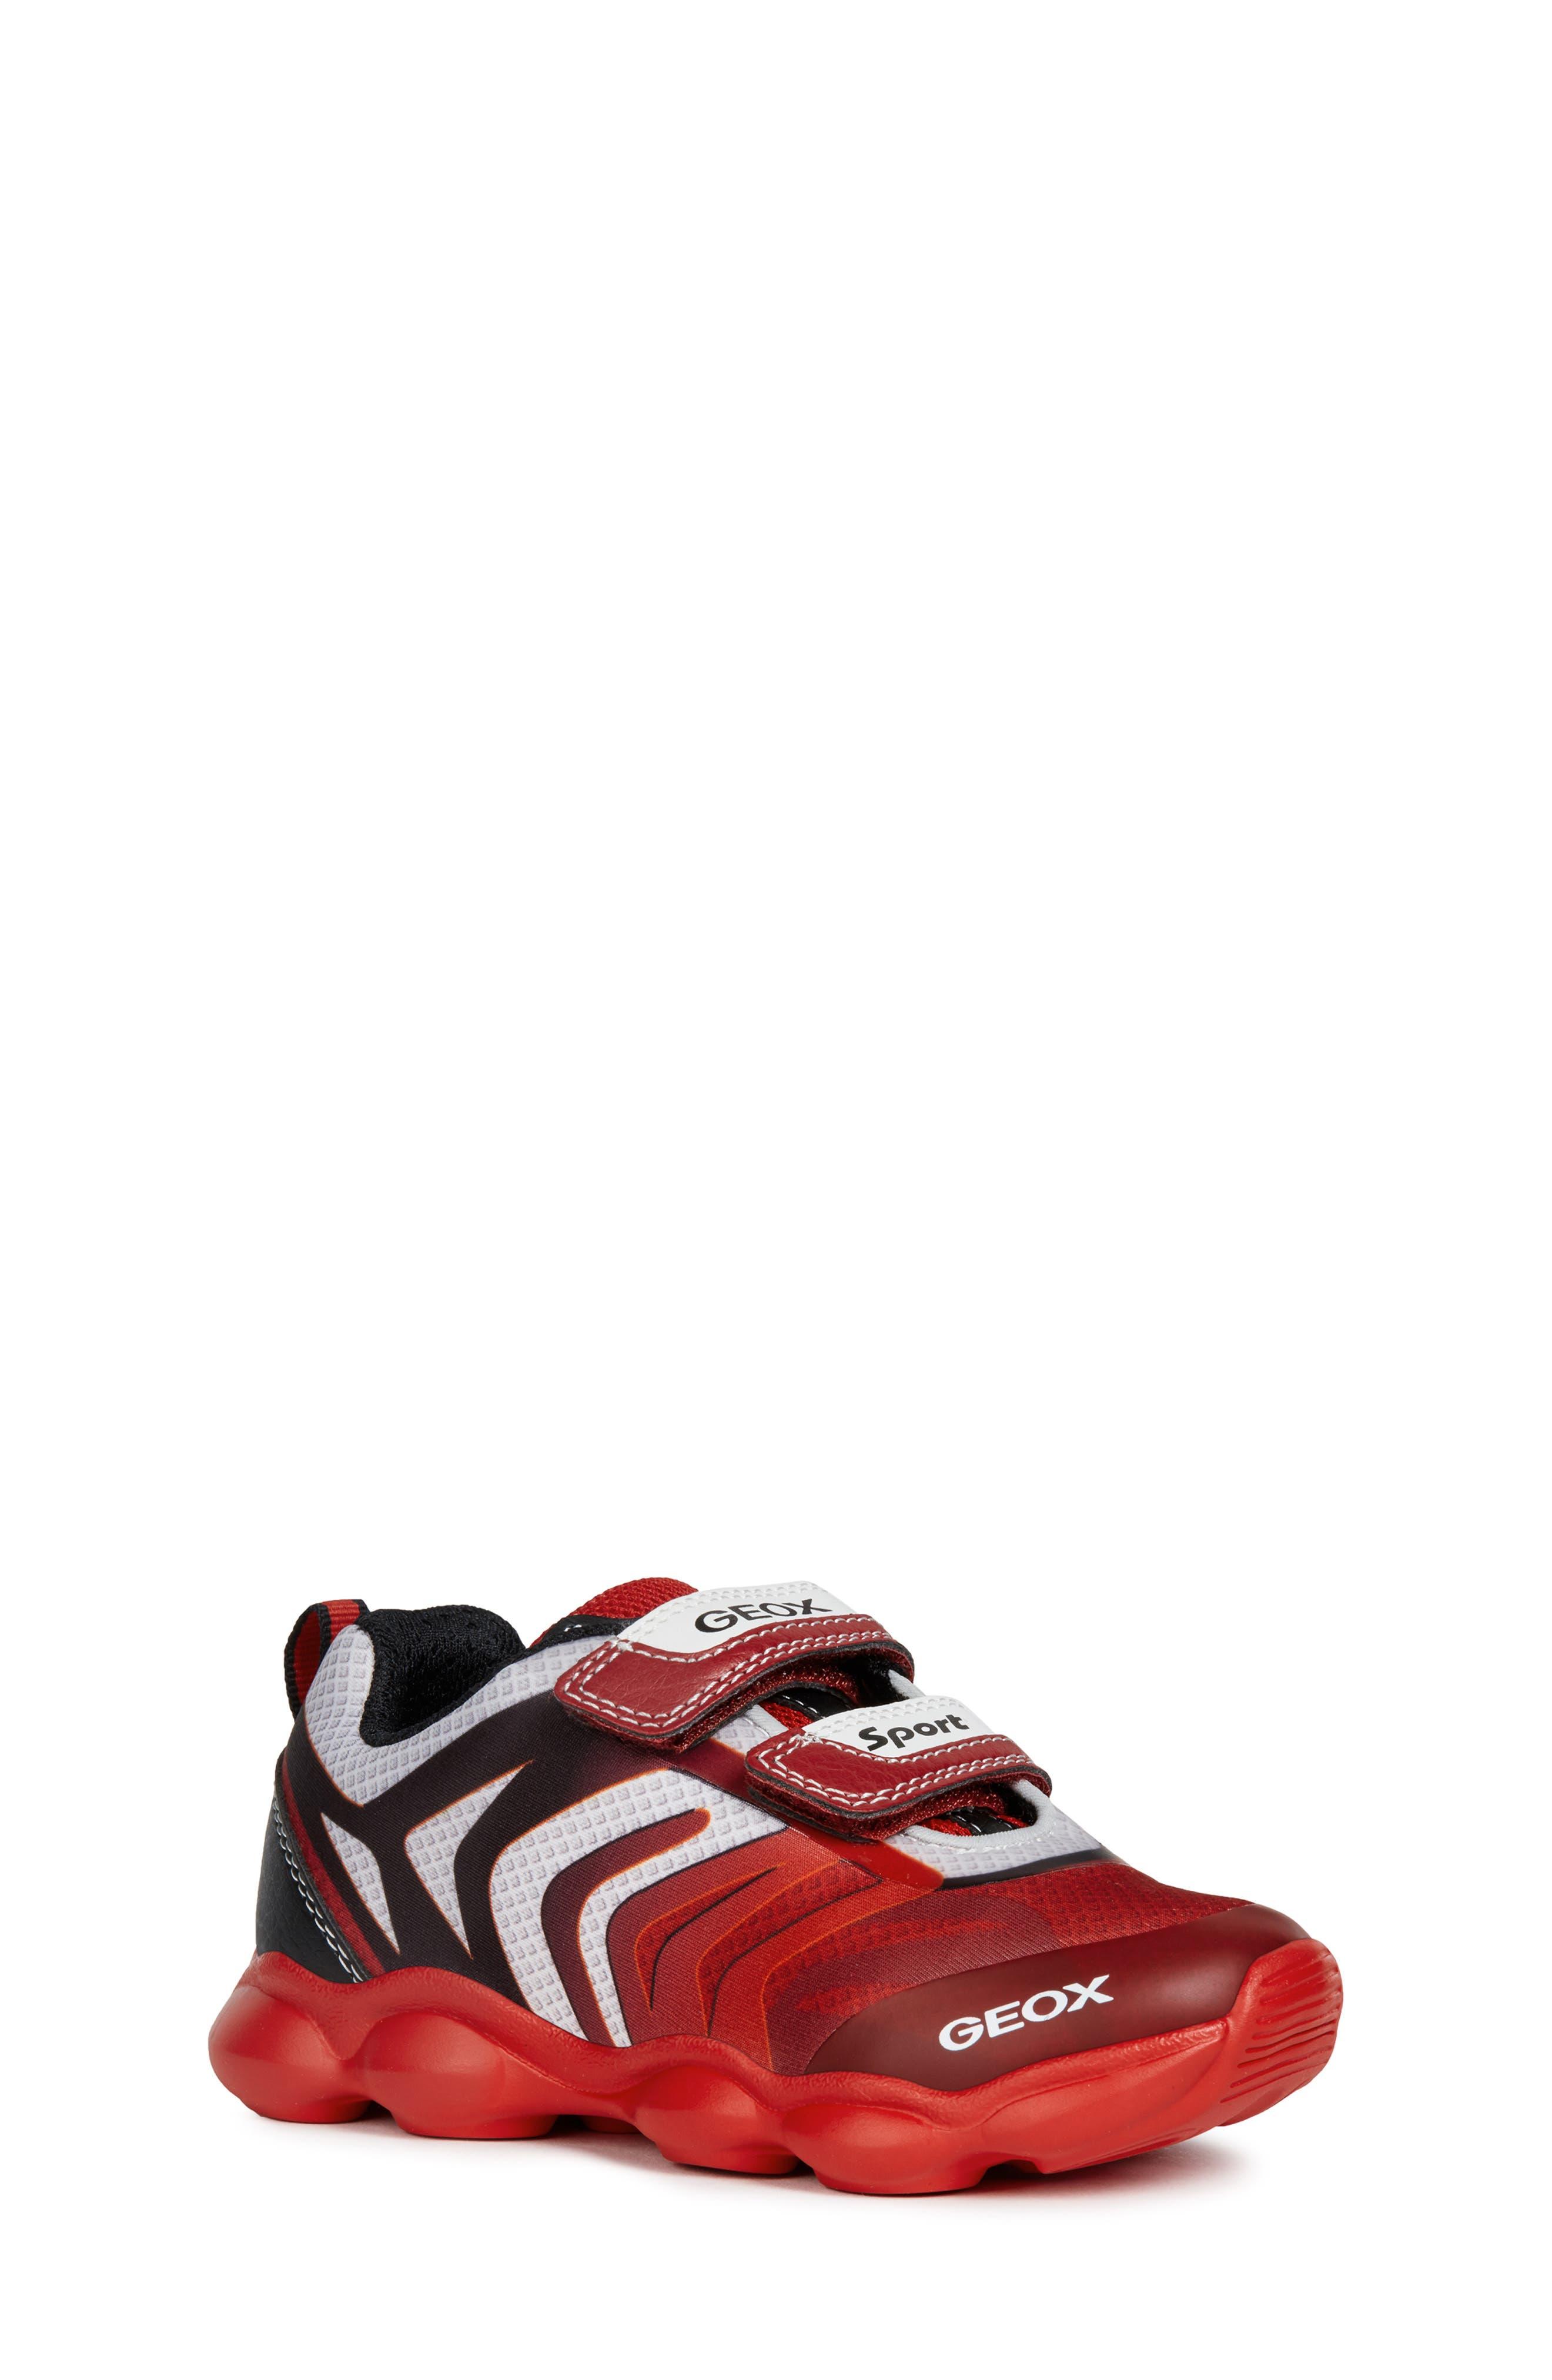 Toddler Boys Geox J Munfrey Sneaker Size 10US  27EU  Red